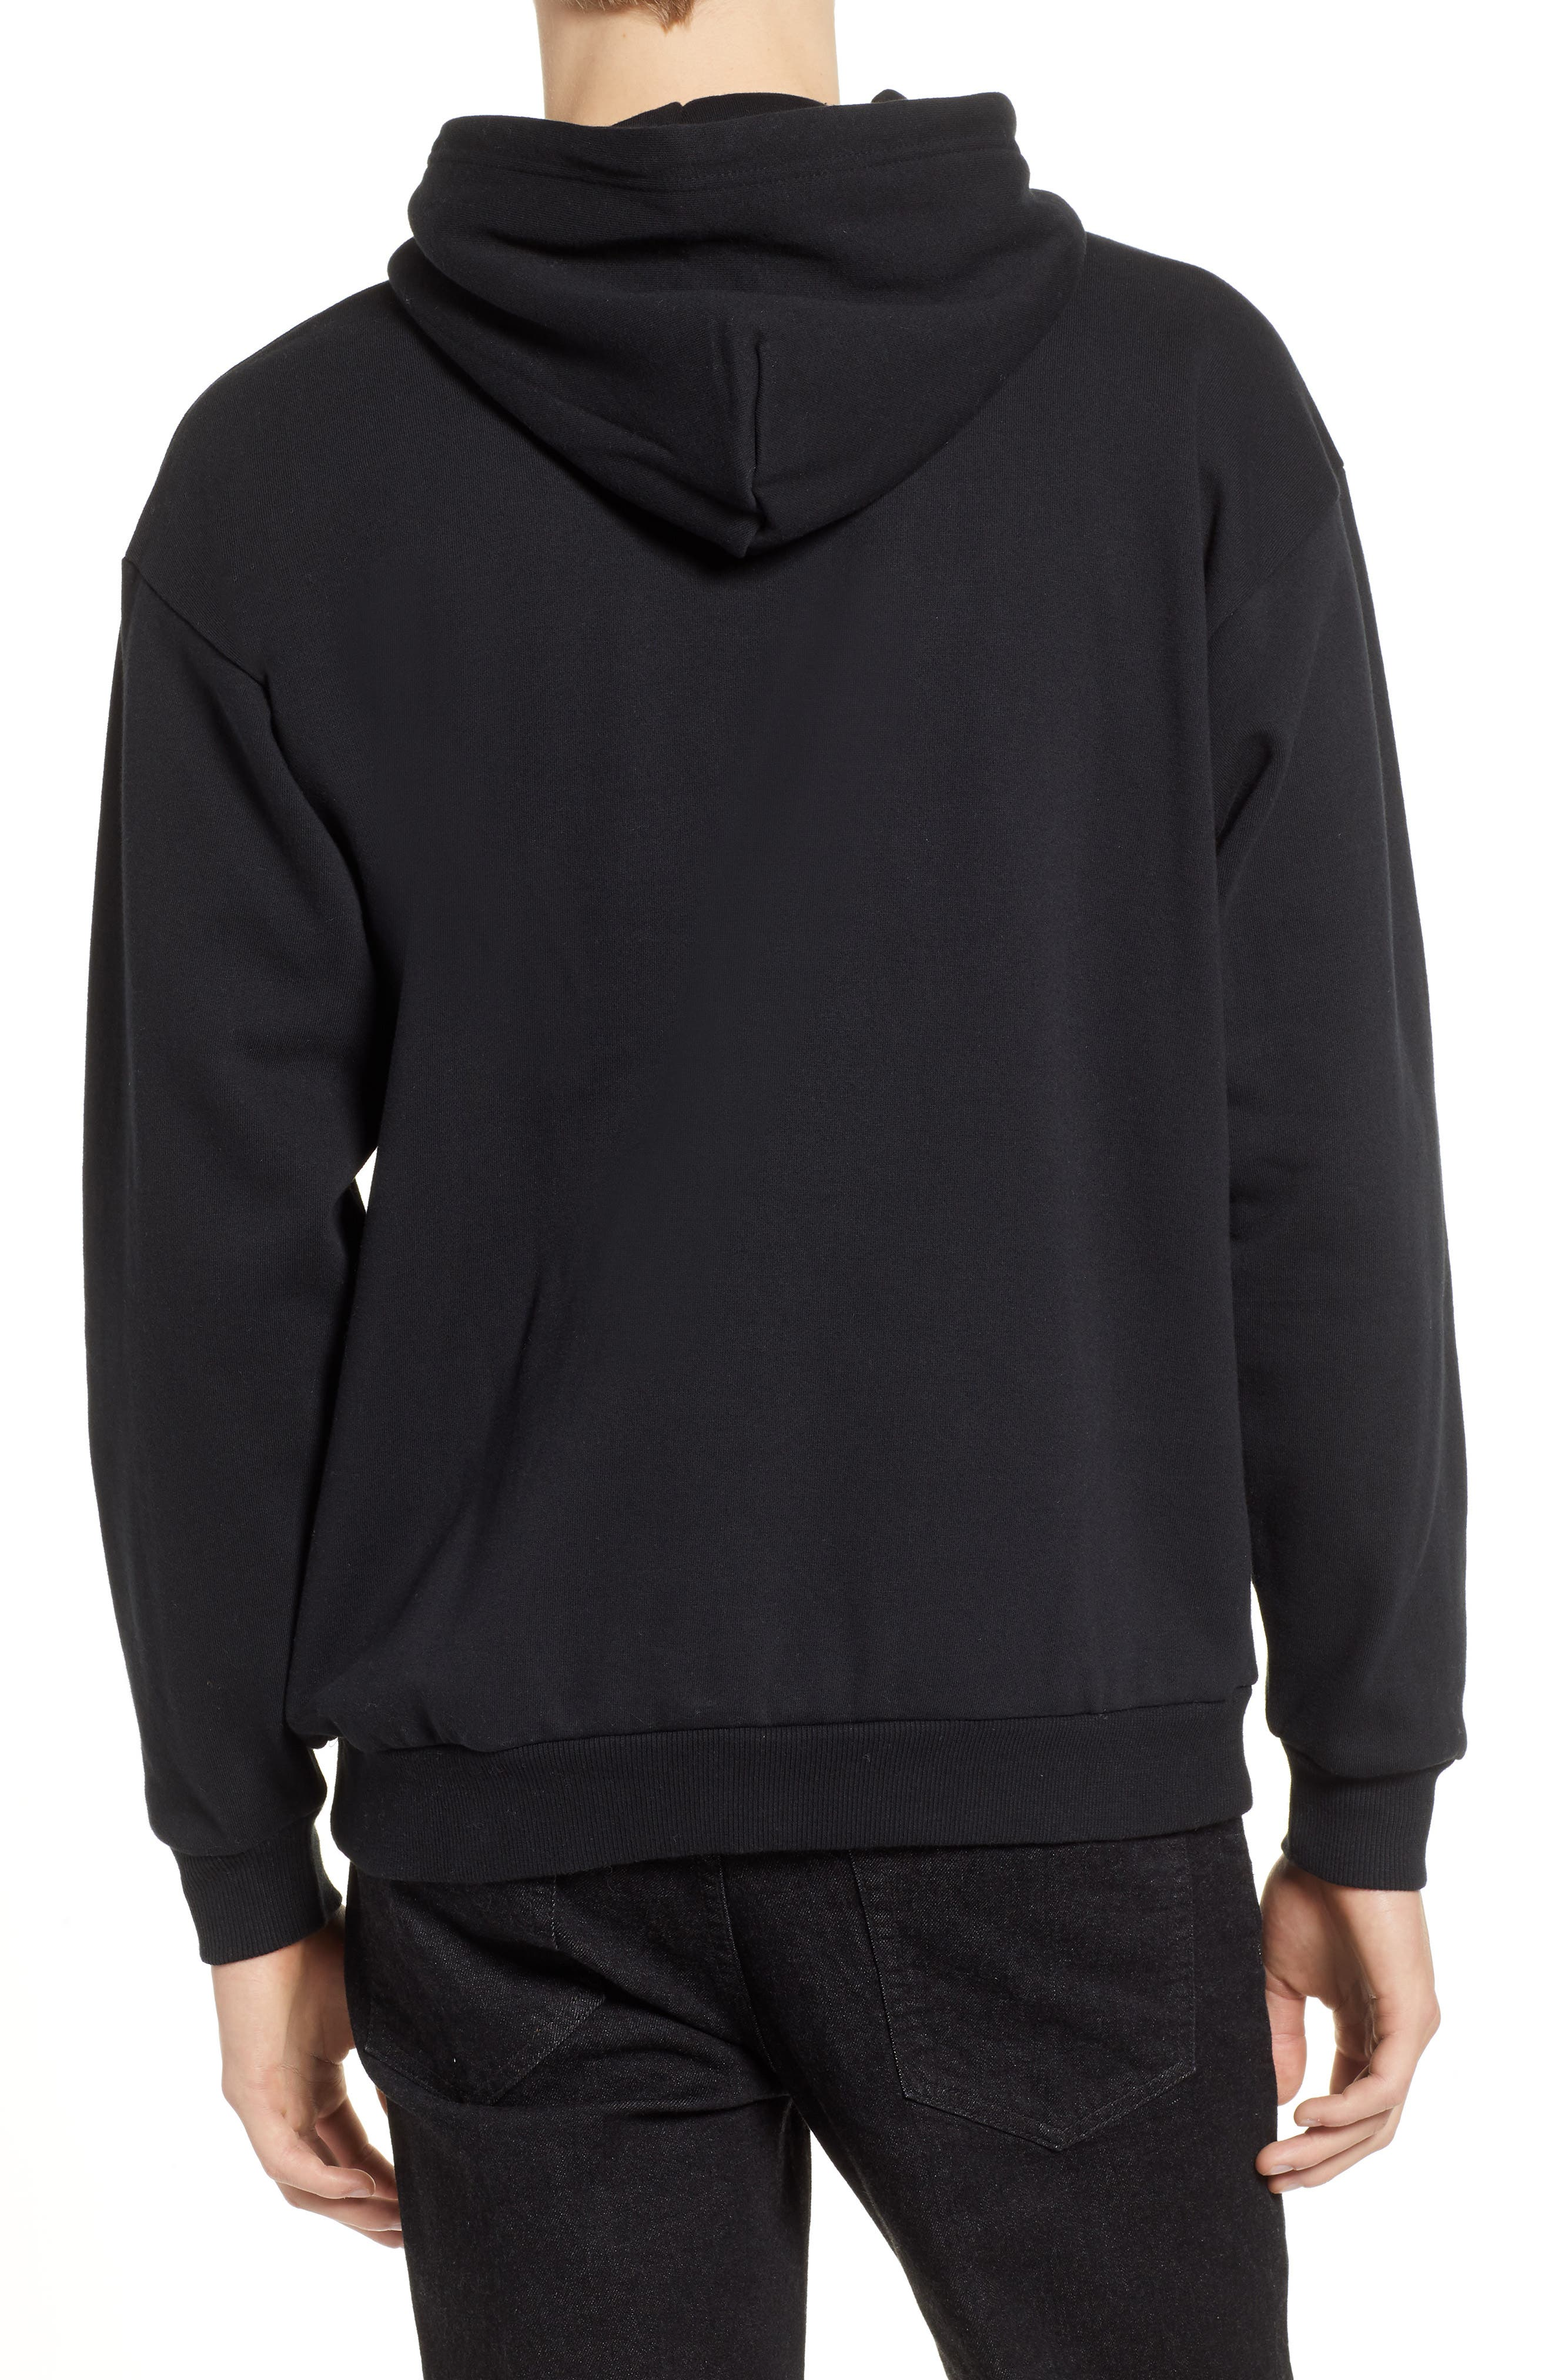 Forte Hooded Sweatshirt,                             Alternate thumbnail 2, color,                             BLACK